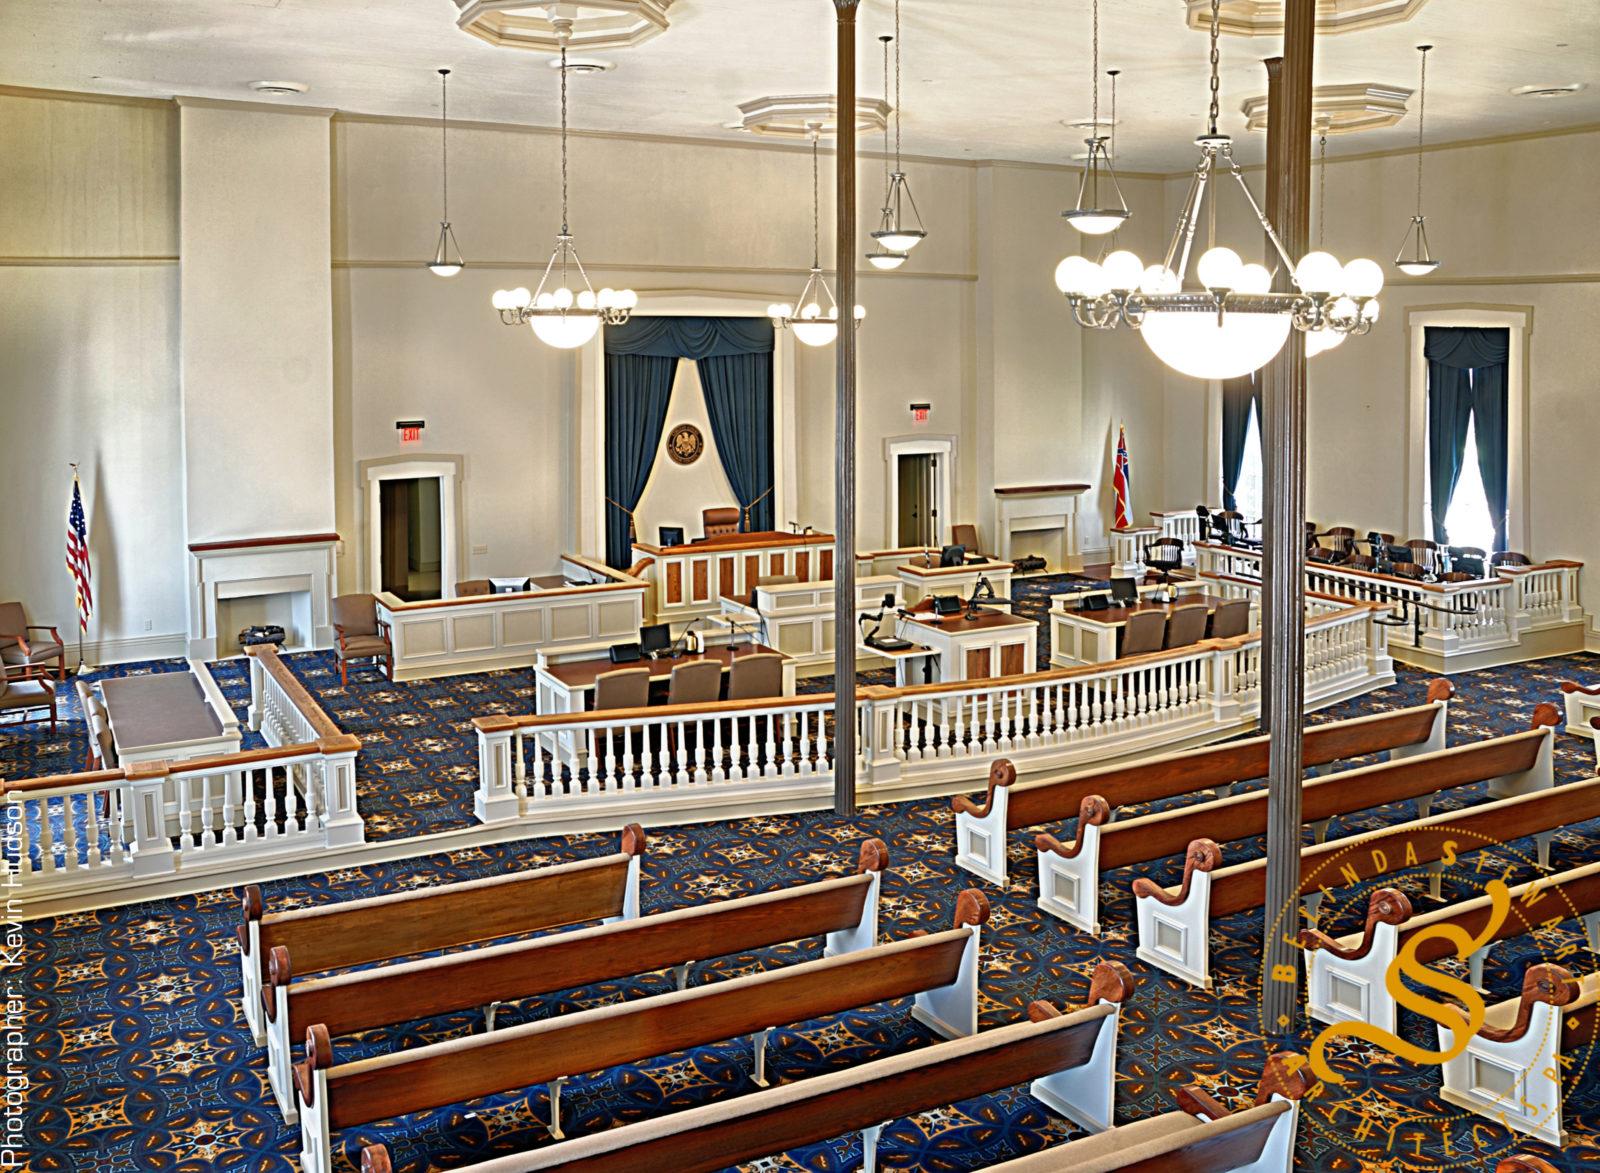 Monroe County Courtroom Renovation & Restoration